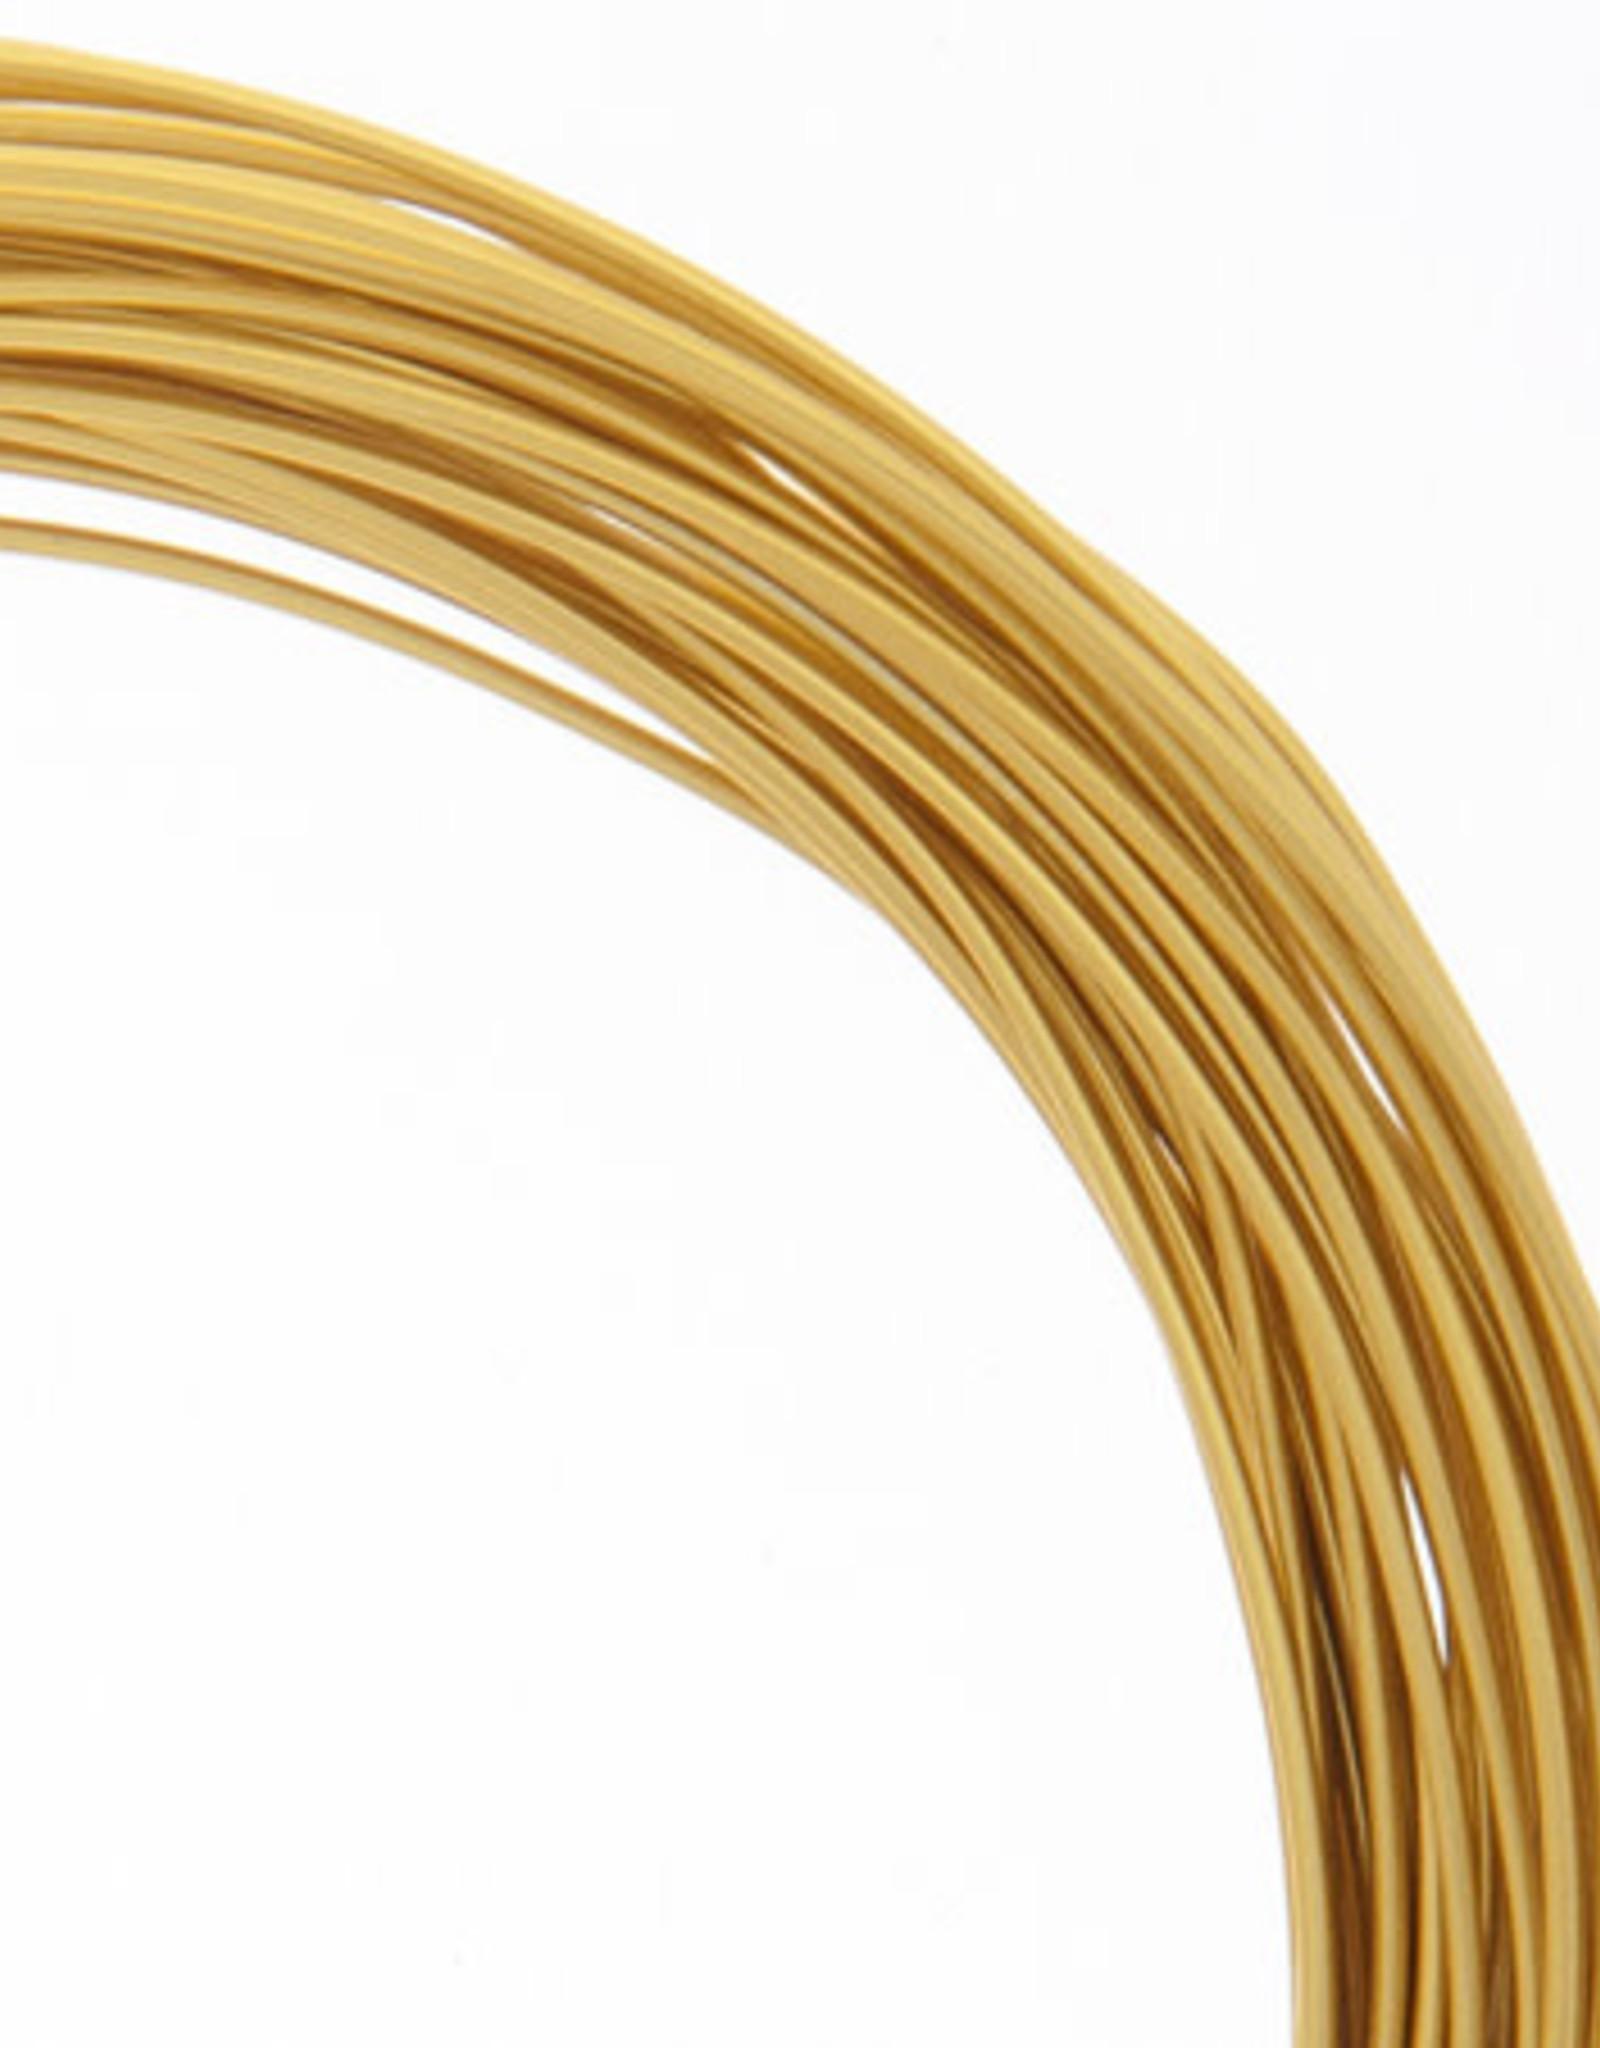 Aluminum Jewelry Wire 30 feet 18 Guage (1.2mm)